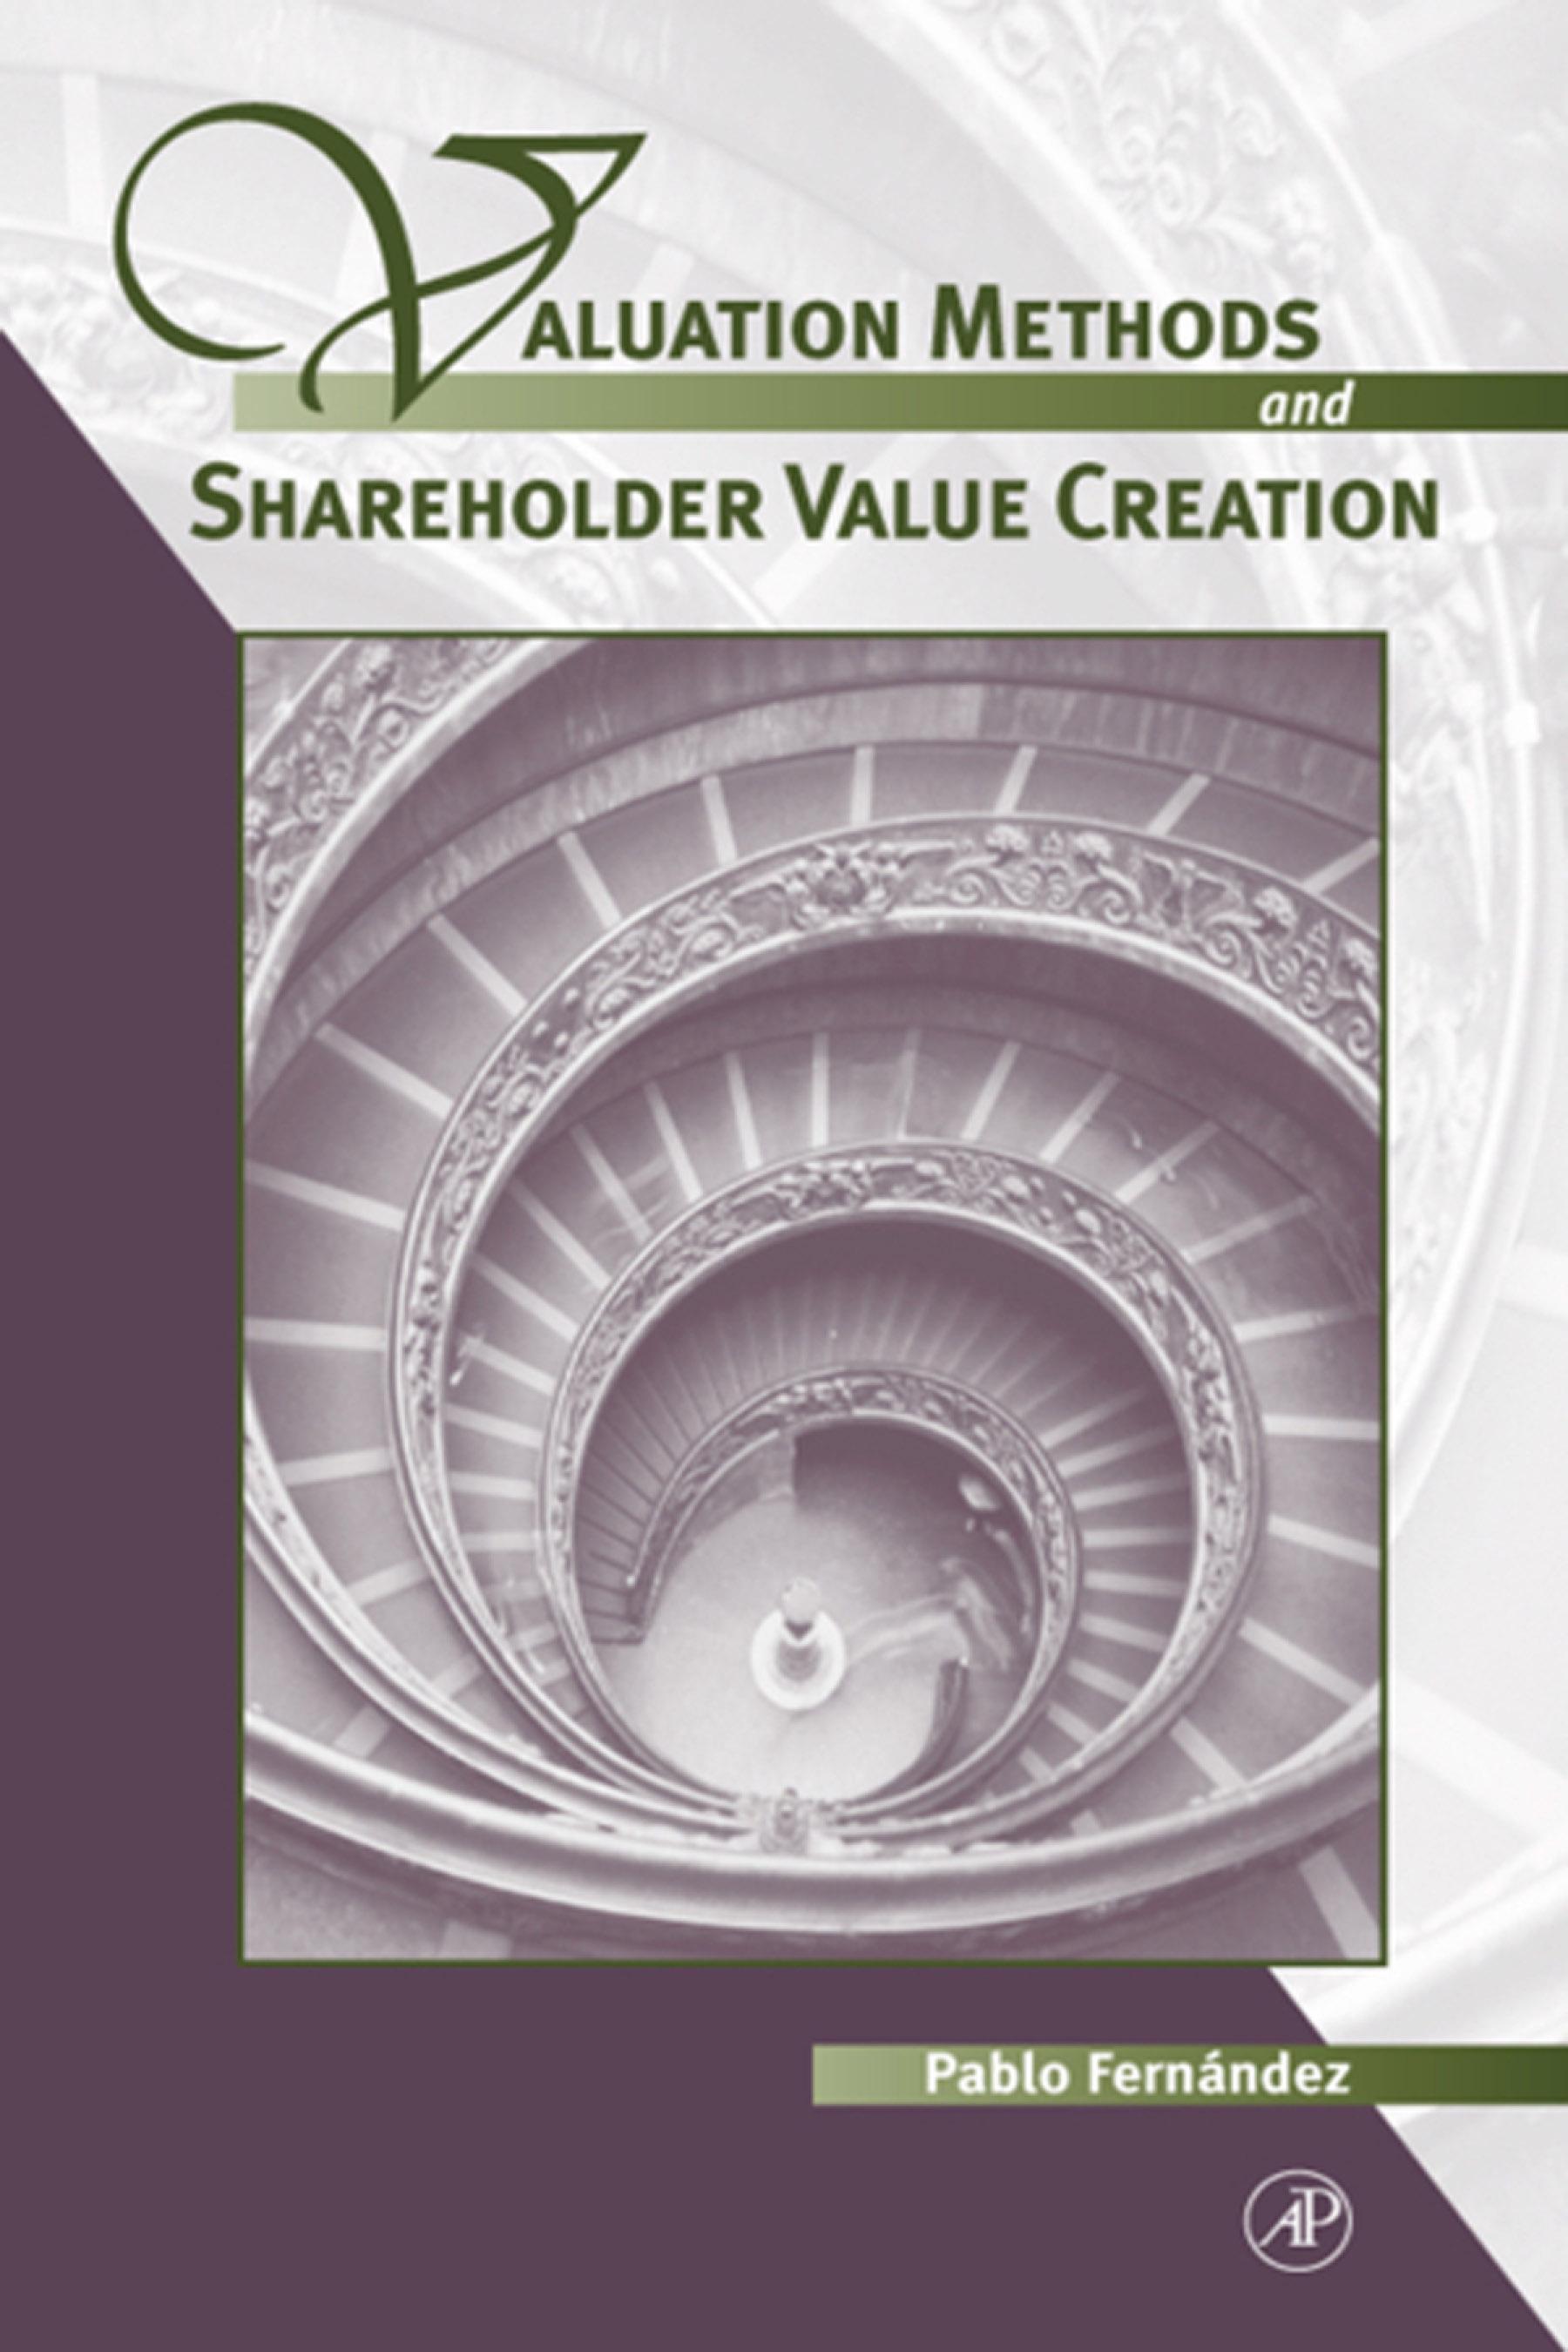 Download Ebook Valuation Methods and Shareholder Value Creation by Pablo Fernandez Pdf